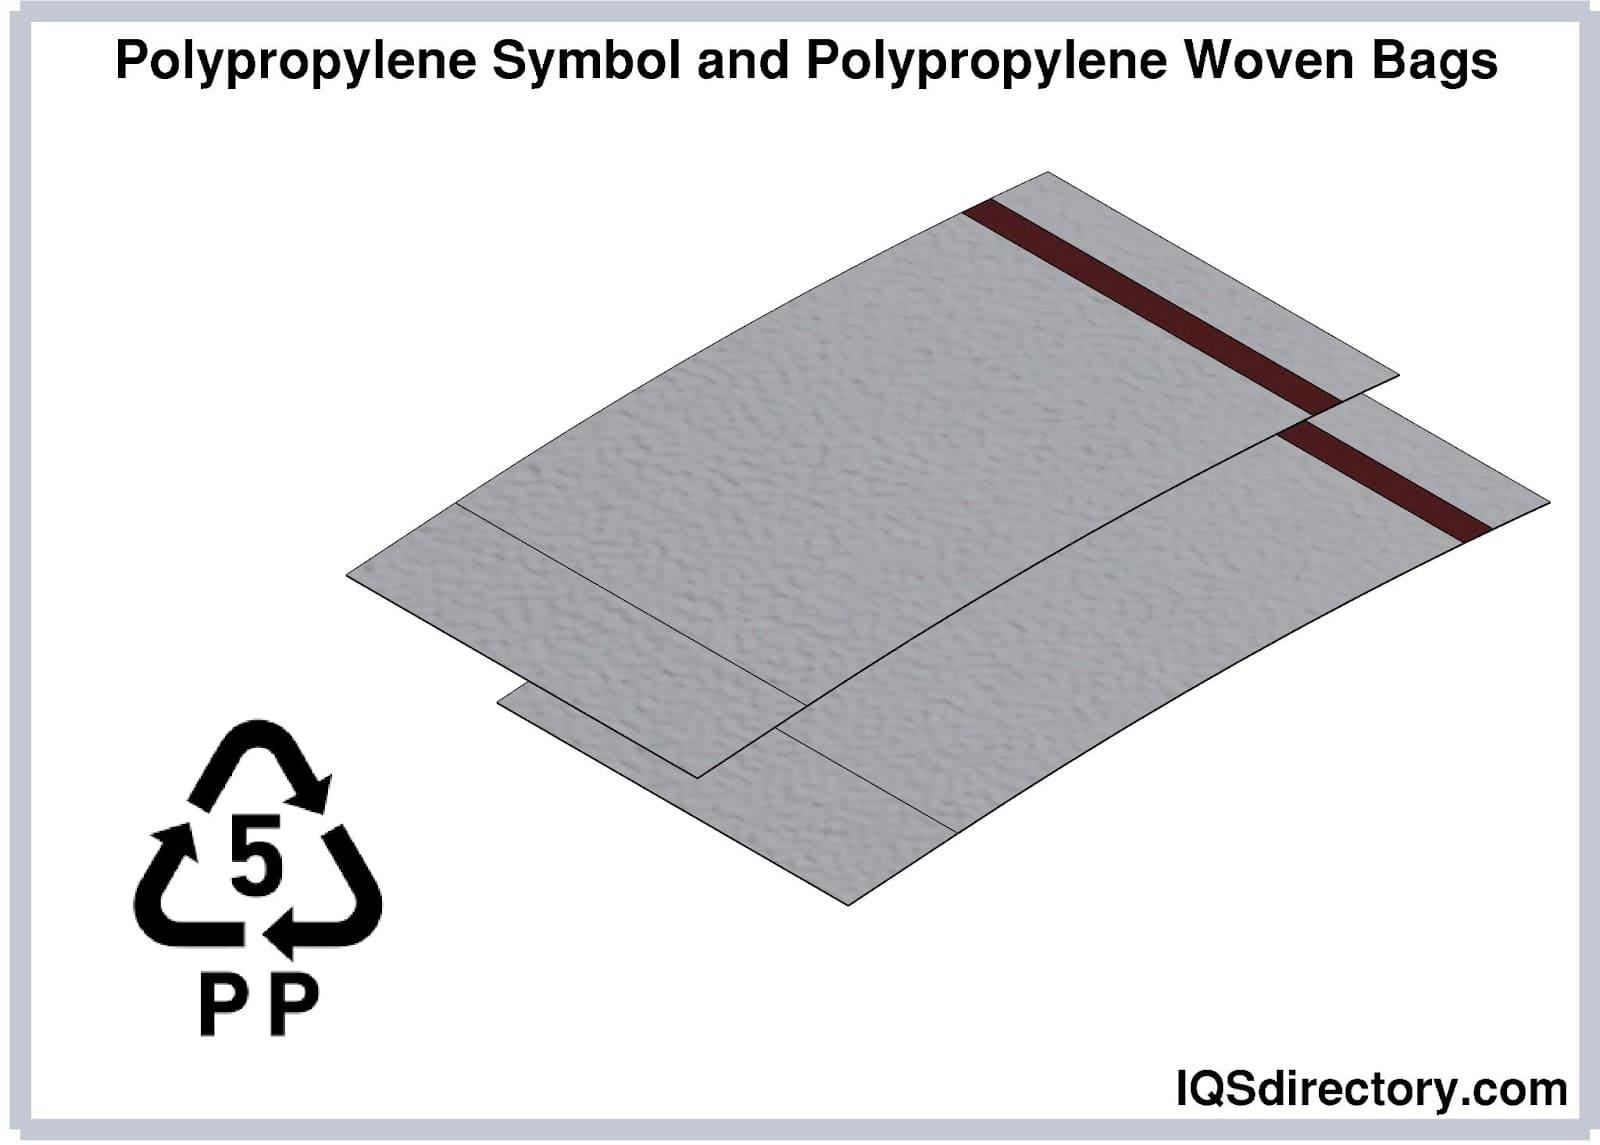 Polypropylene Symbol and Polypropylene Woven Bags